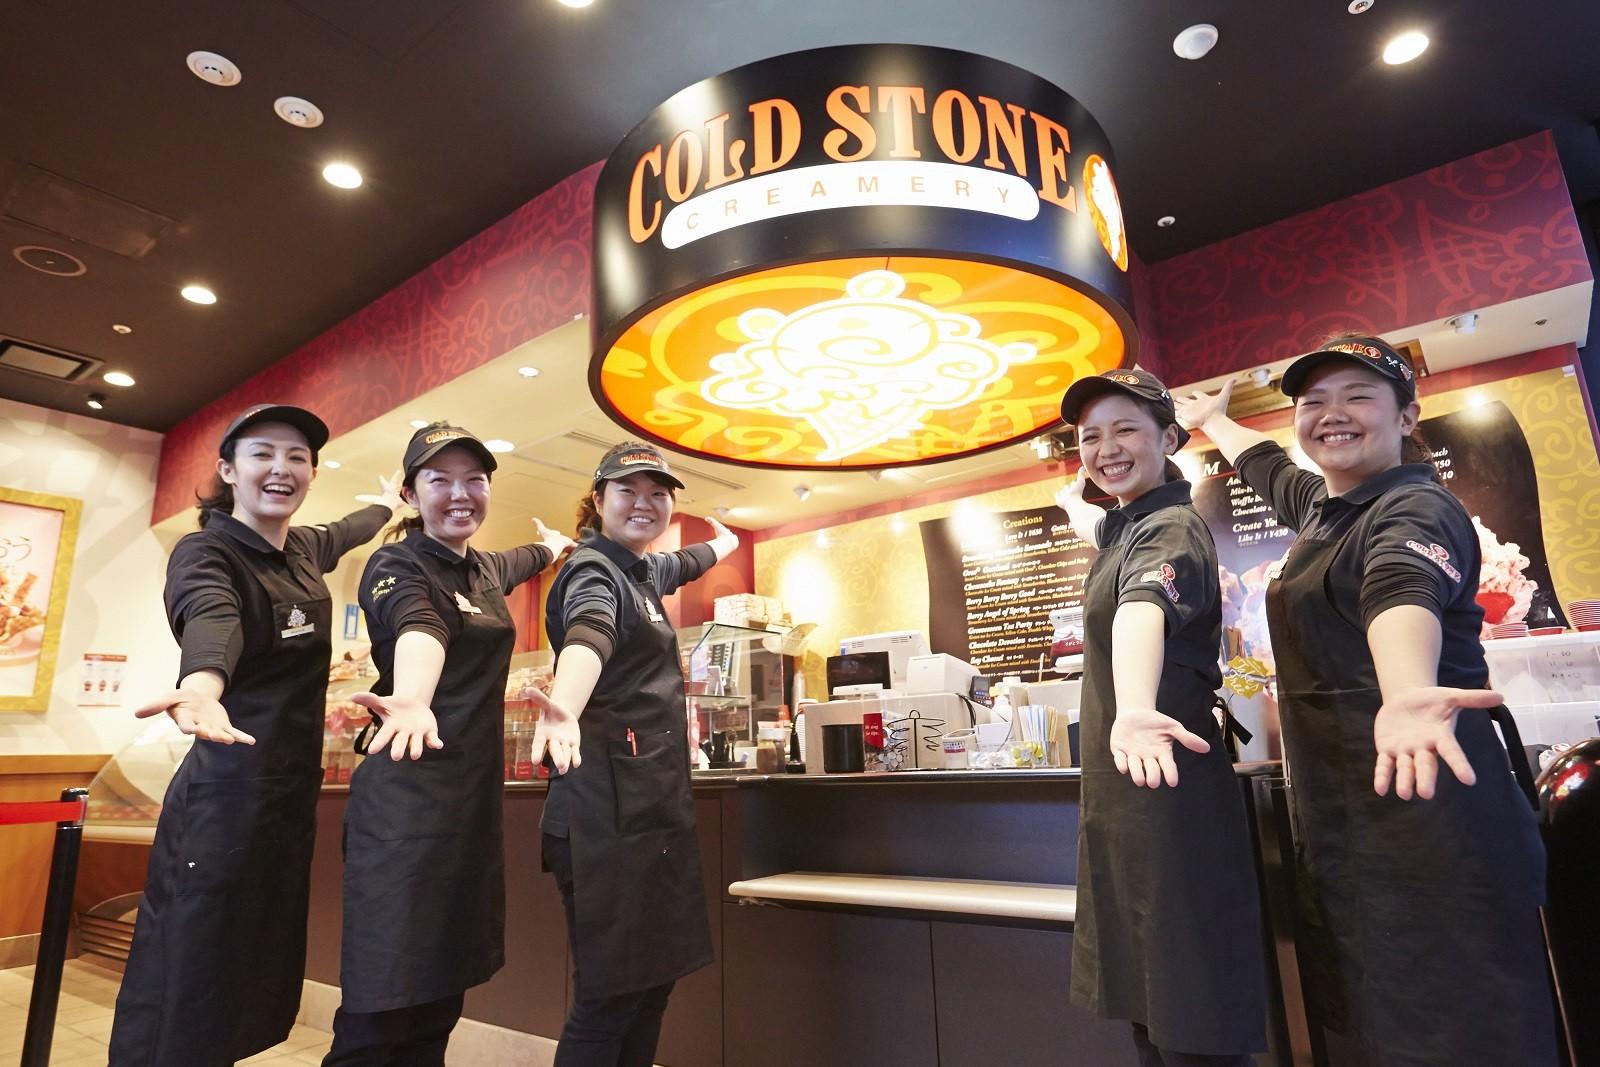 COLD STONE CREAMERY(コールドストーンクリーマリー) 軽井沢・プリンスショッピングプラザ店のアルバイト情報